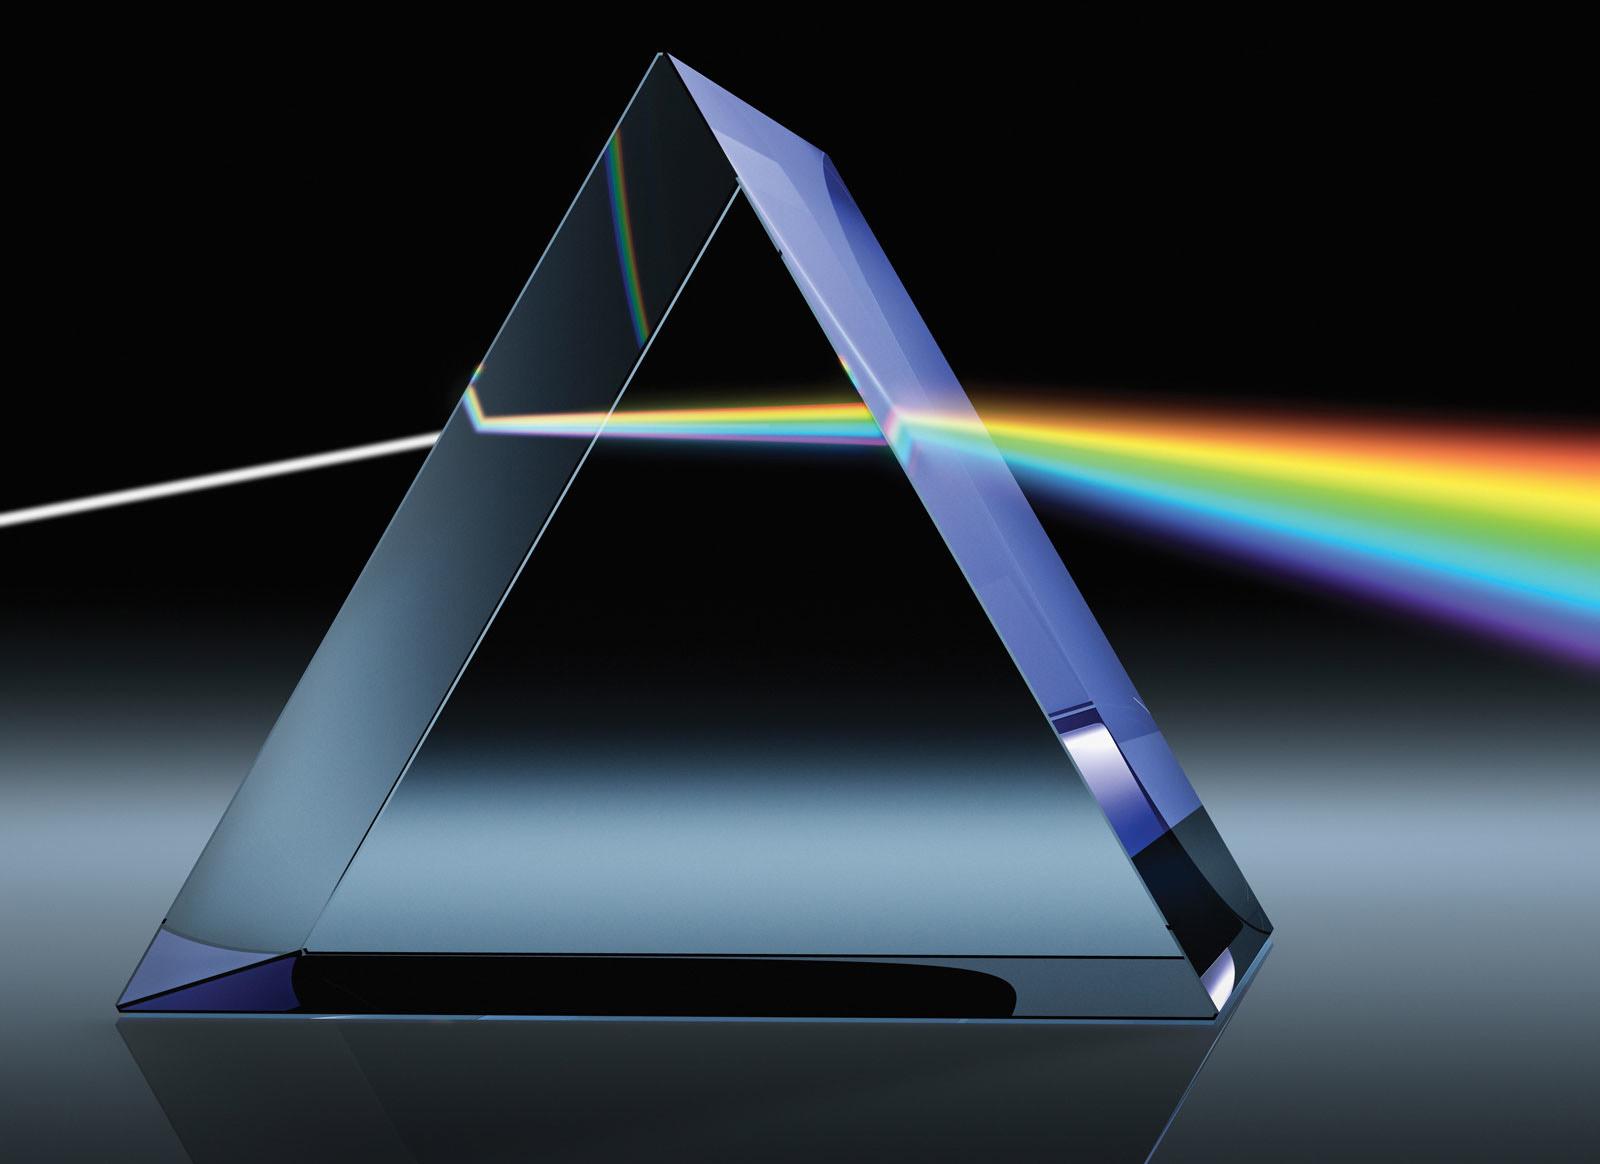 World\'s Fastest Camera Captures Light at 4.4 Trillion Frames Per Second